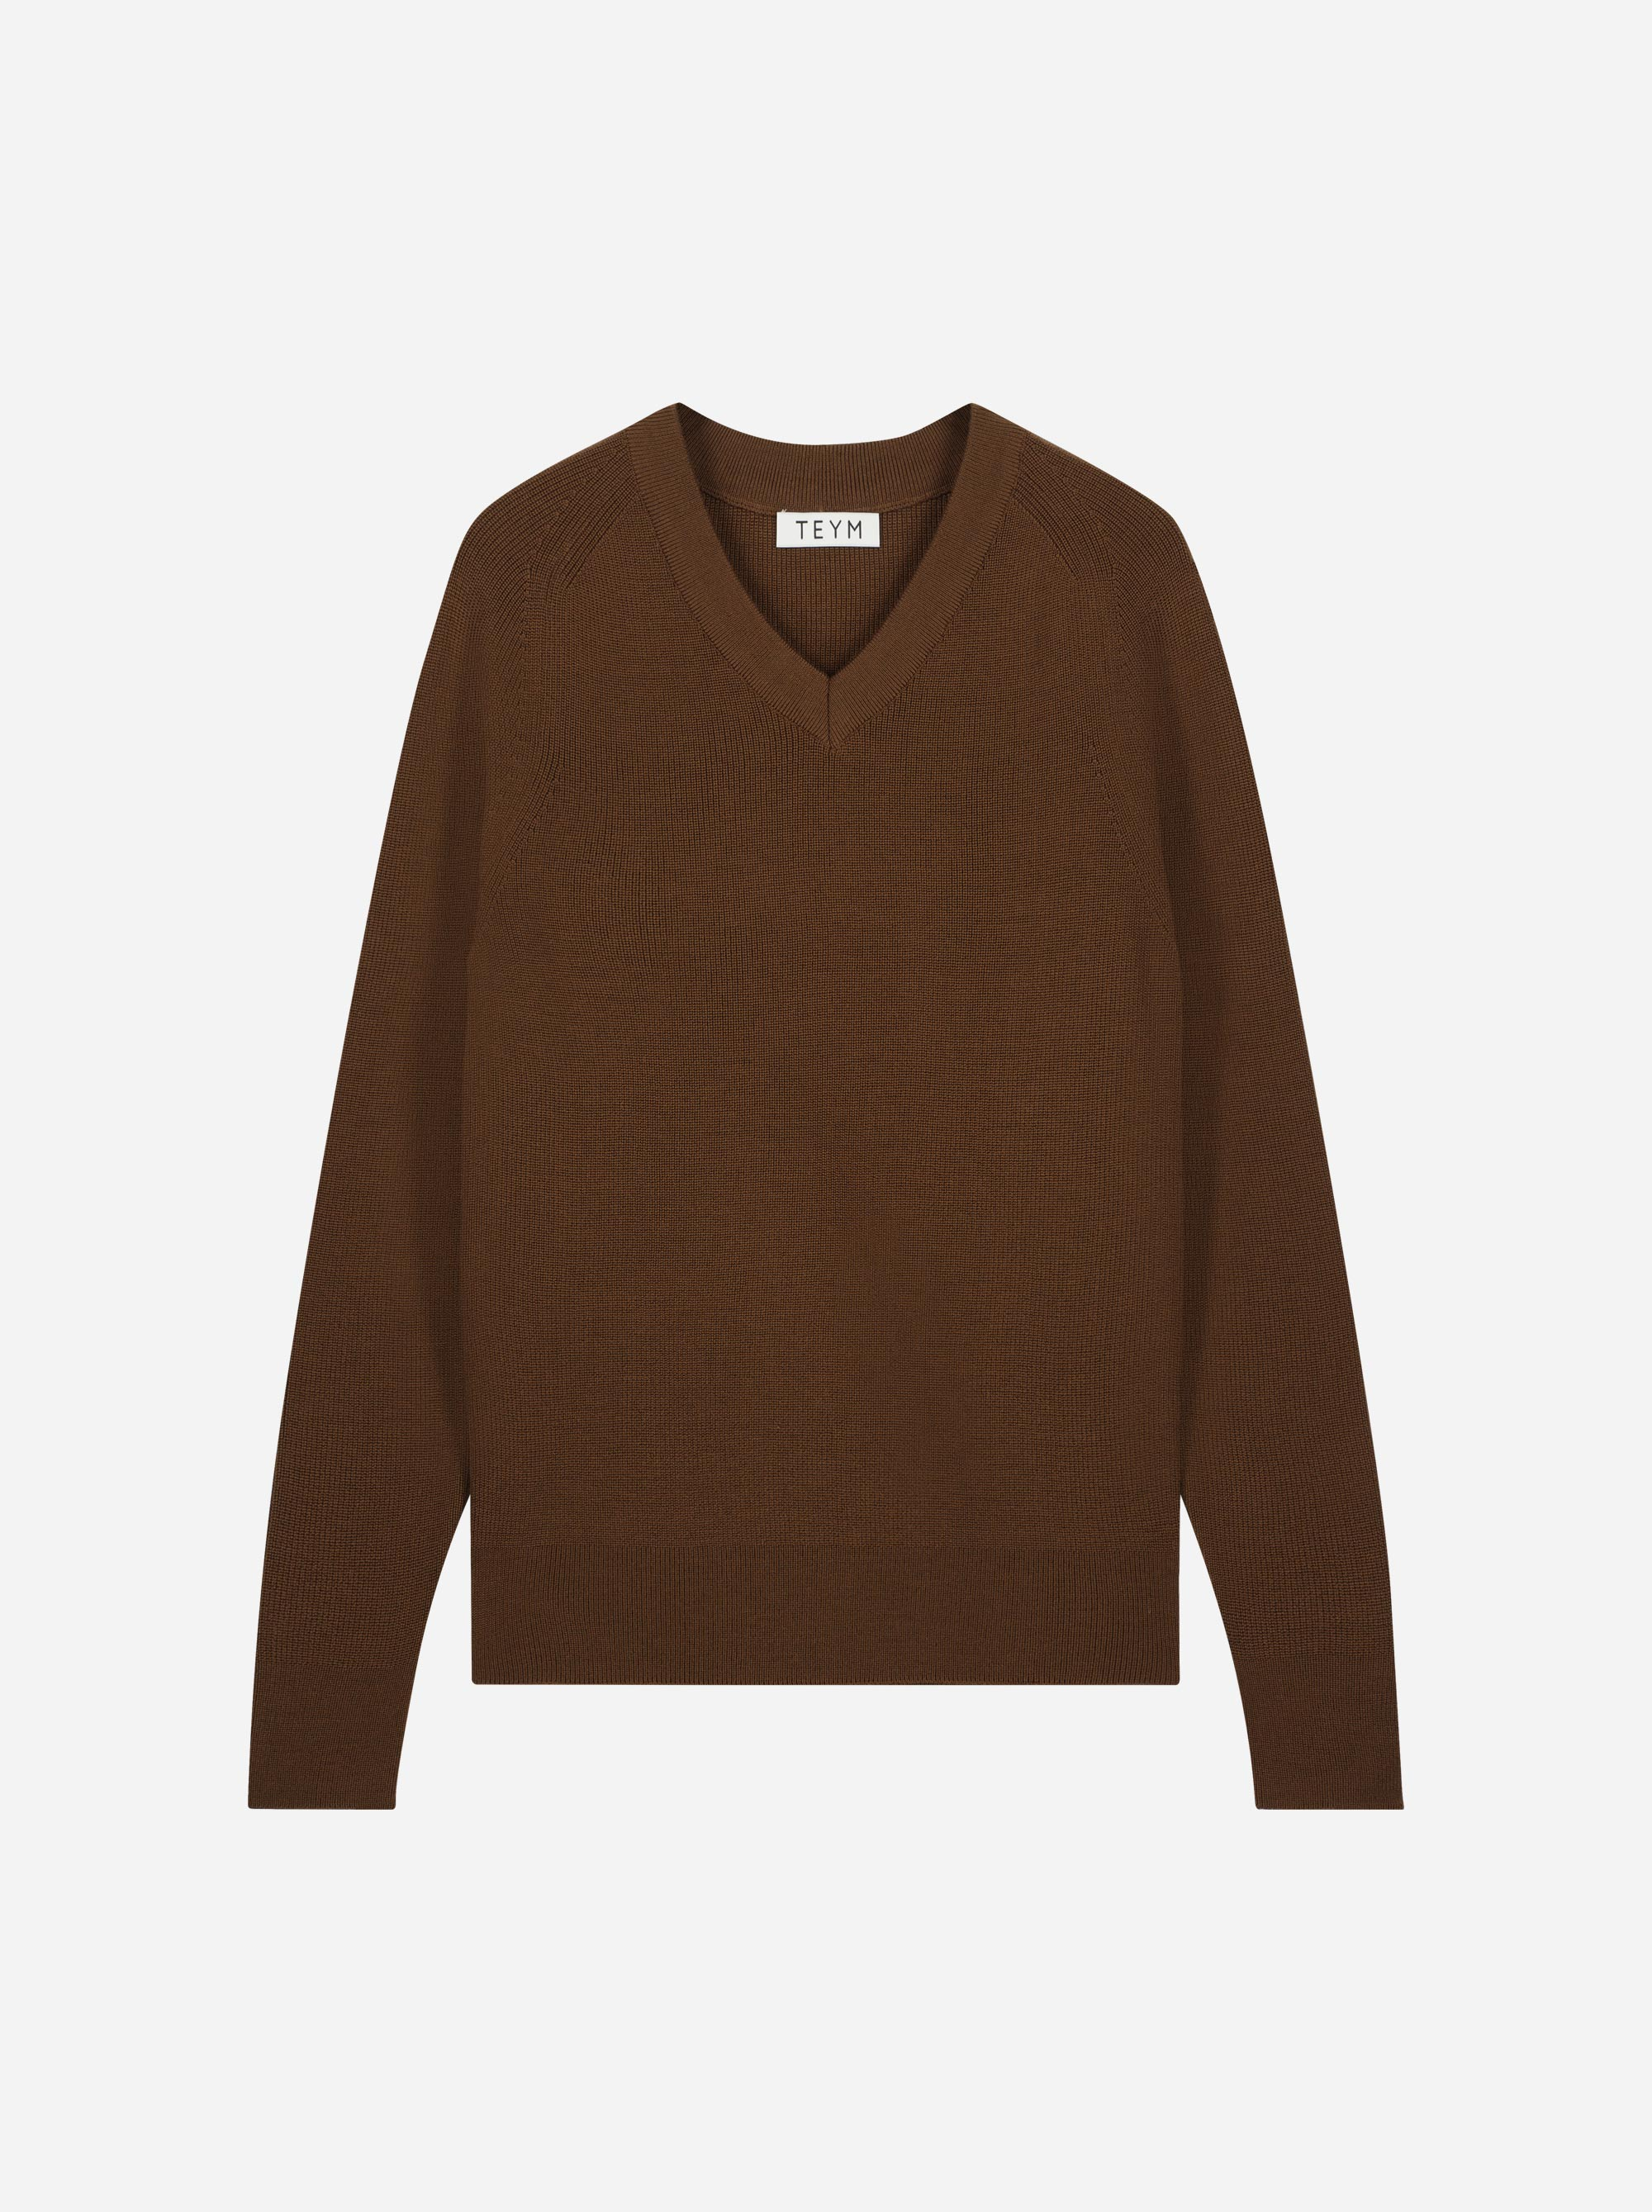 Teym_Merino-Sweater-V-Neck_Dark_Brown_front_1